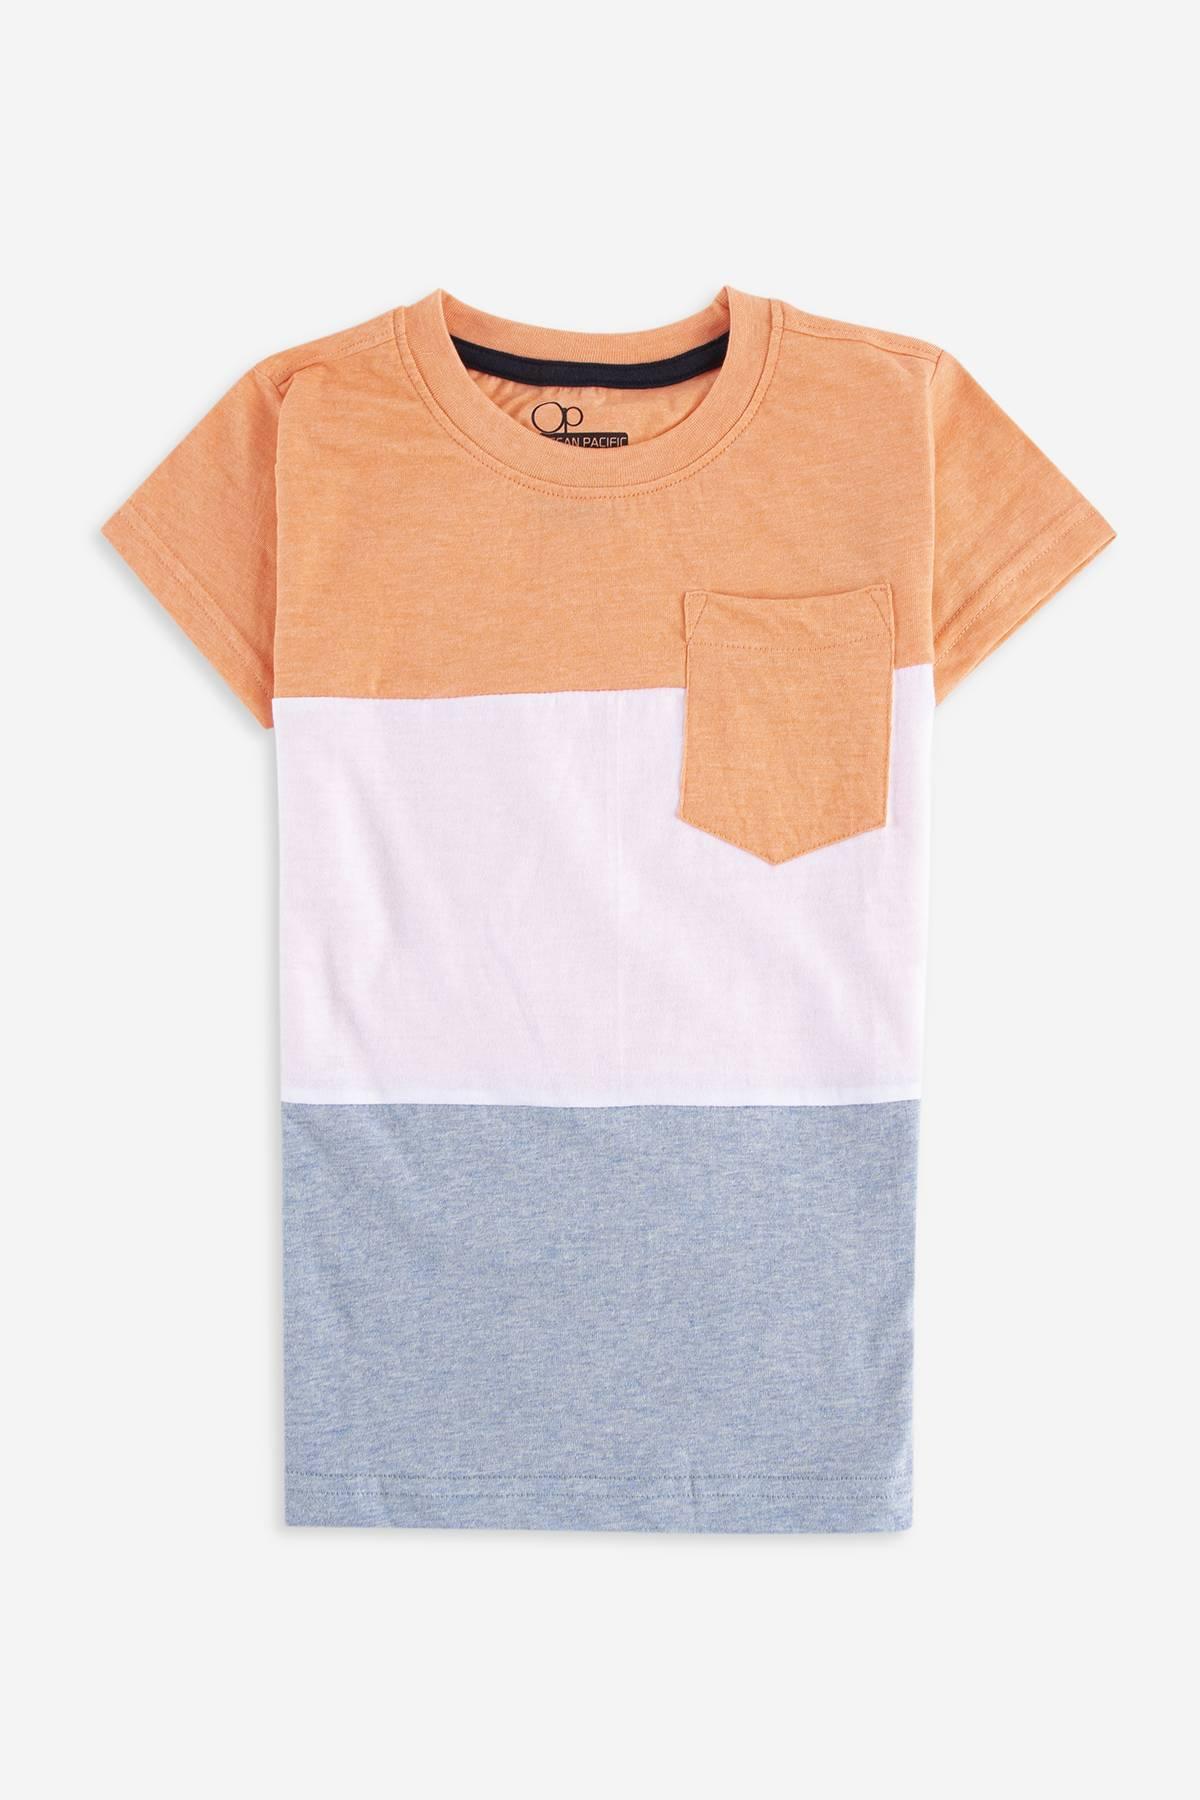 PFIFF Rivetta Camiseta de competici/ón para Mujer Color Azul Oscuro